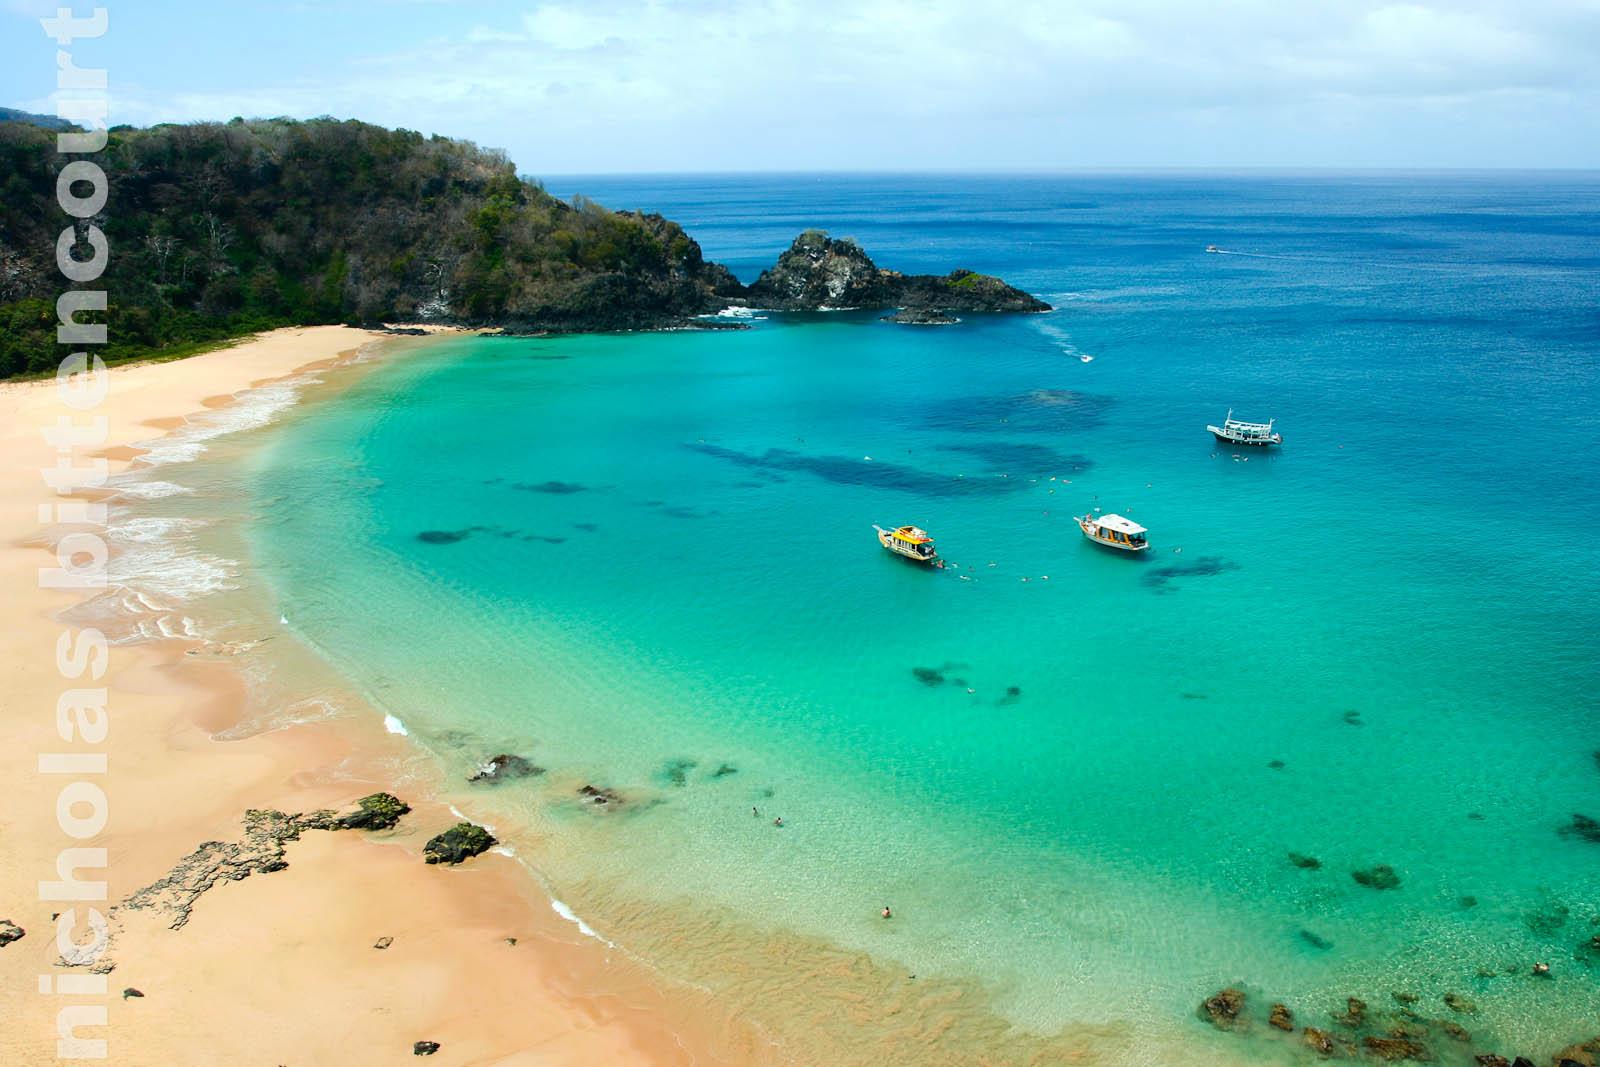 39af997768b1a 8 of Brazil s best beaches